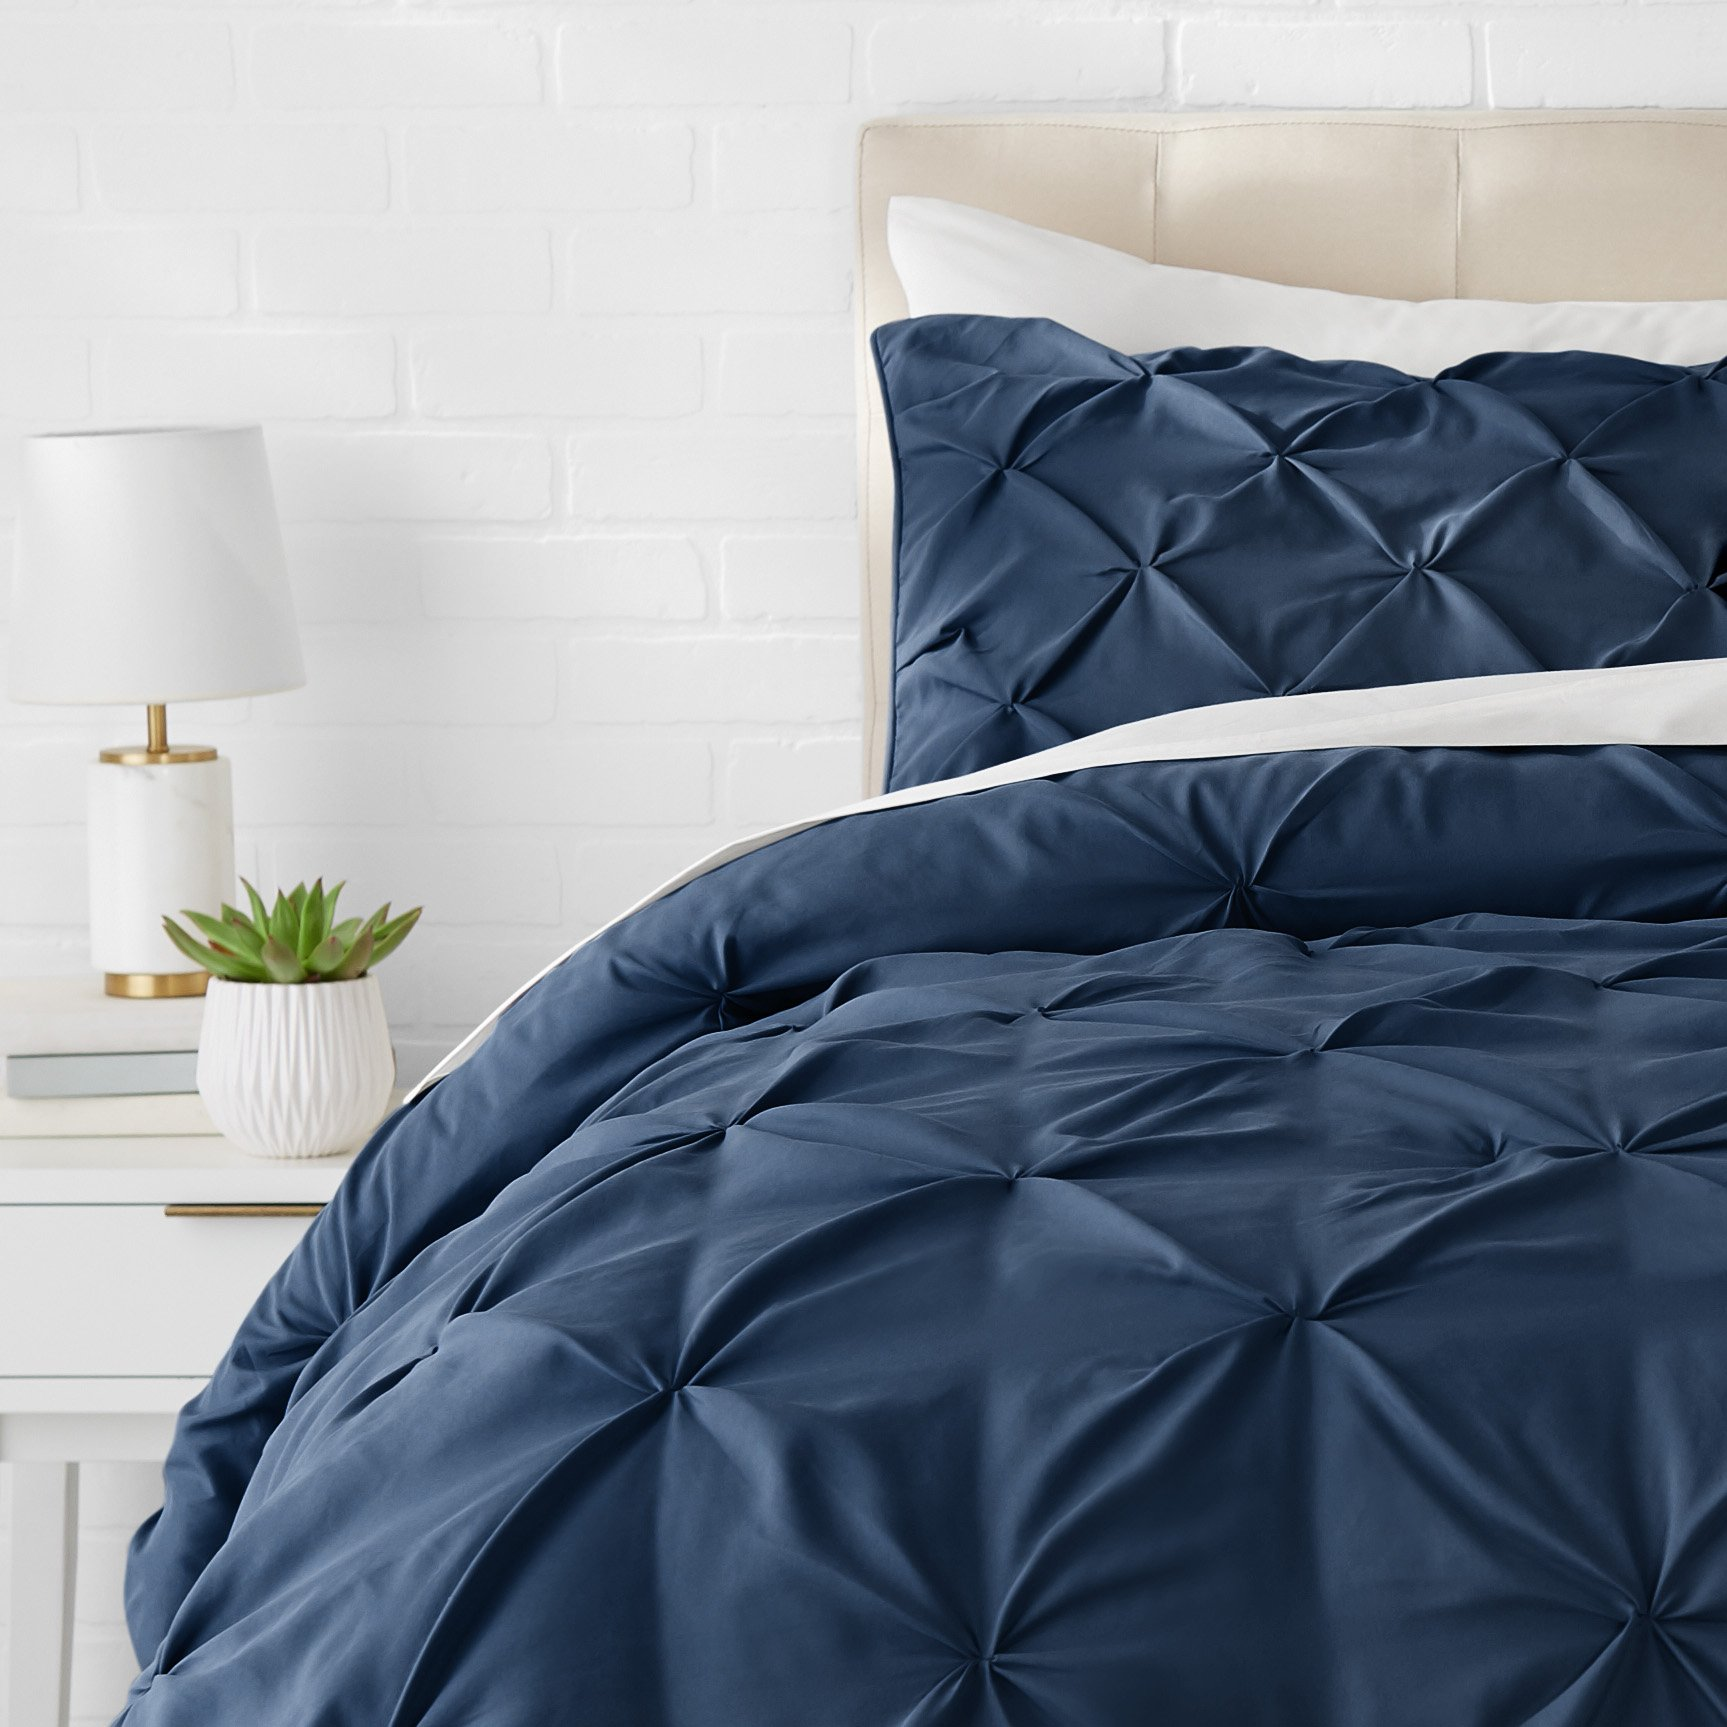 AmazonBasics Pinch Pleat Comforter Set - Twin, Navy Blue